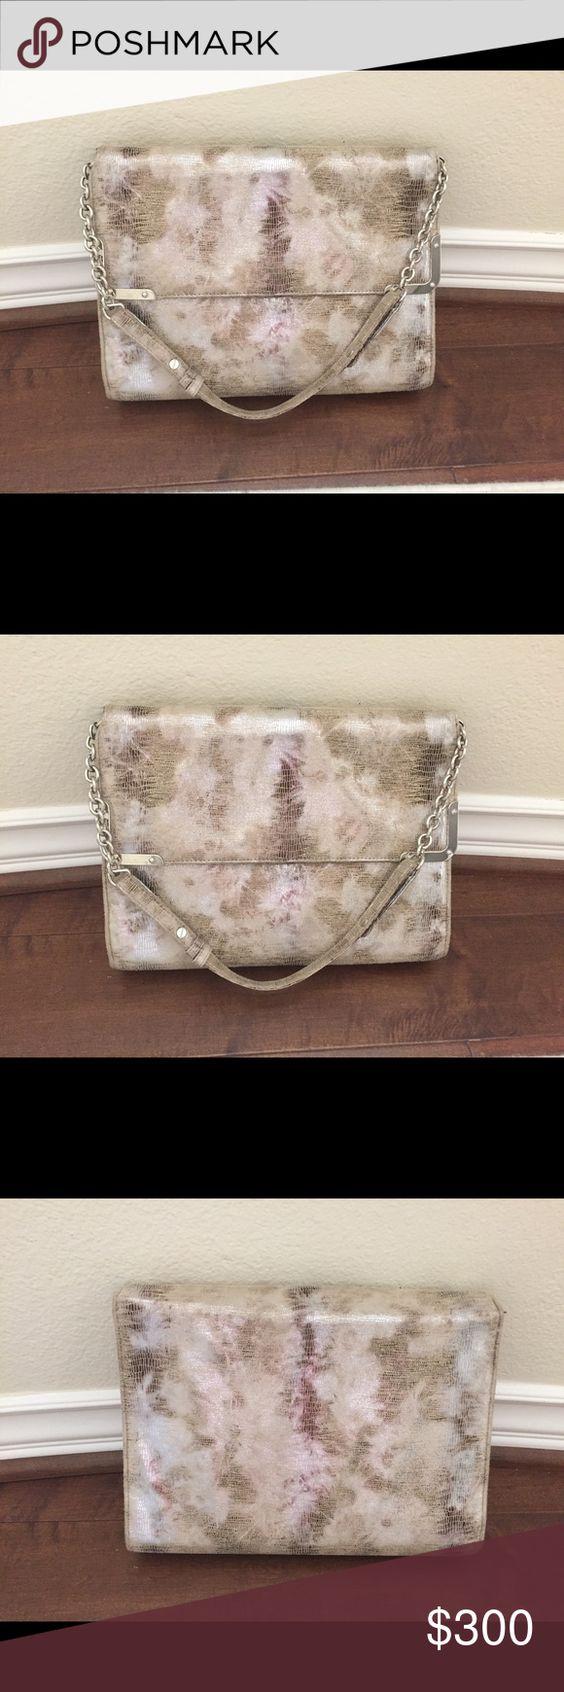 Cream/metallic purse😍 Like new! Worn once! Bags Clutches & Wristlets